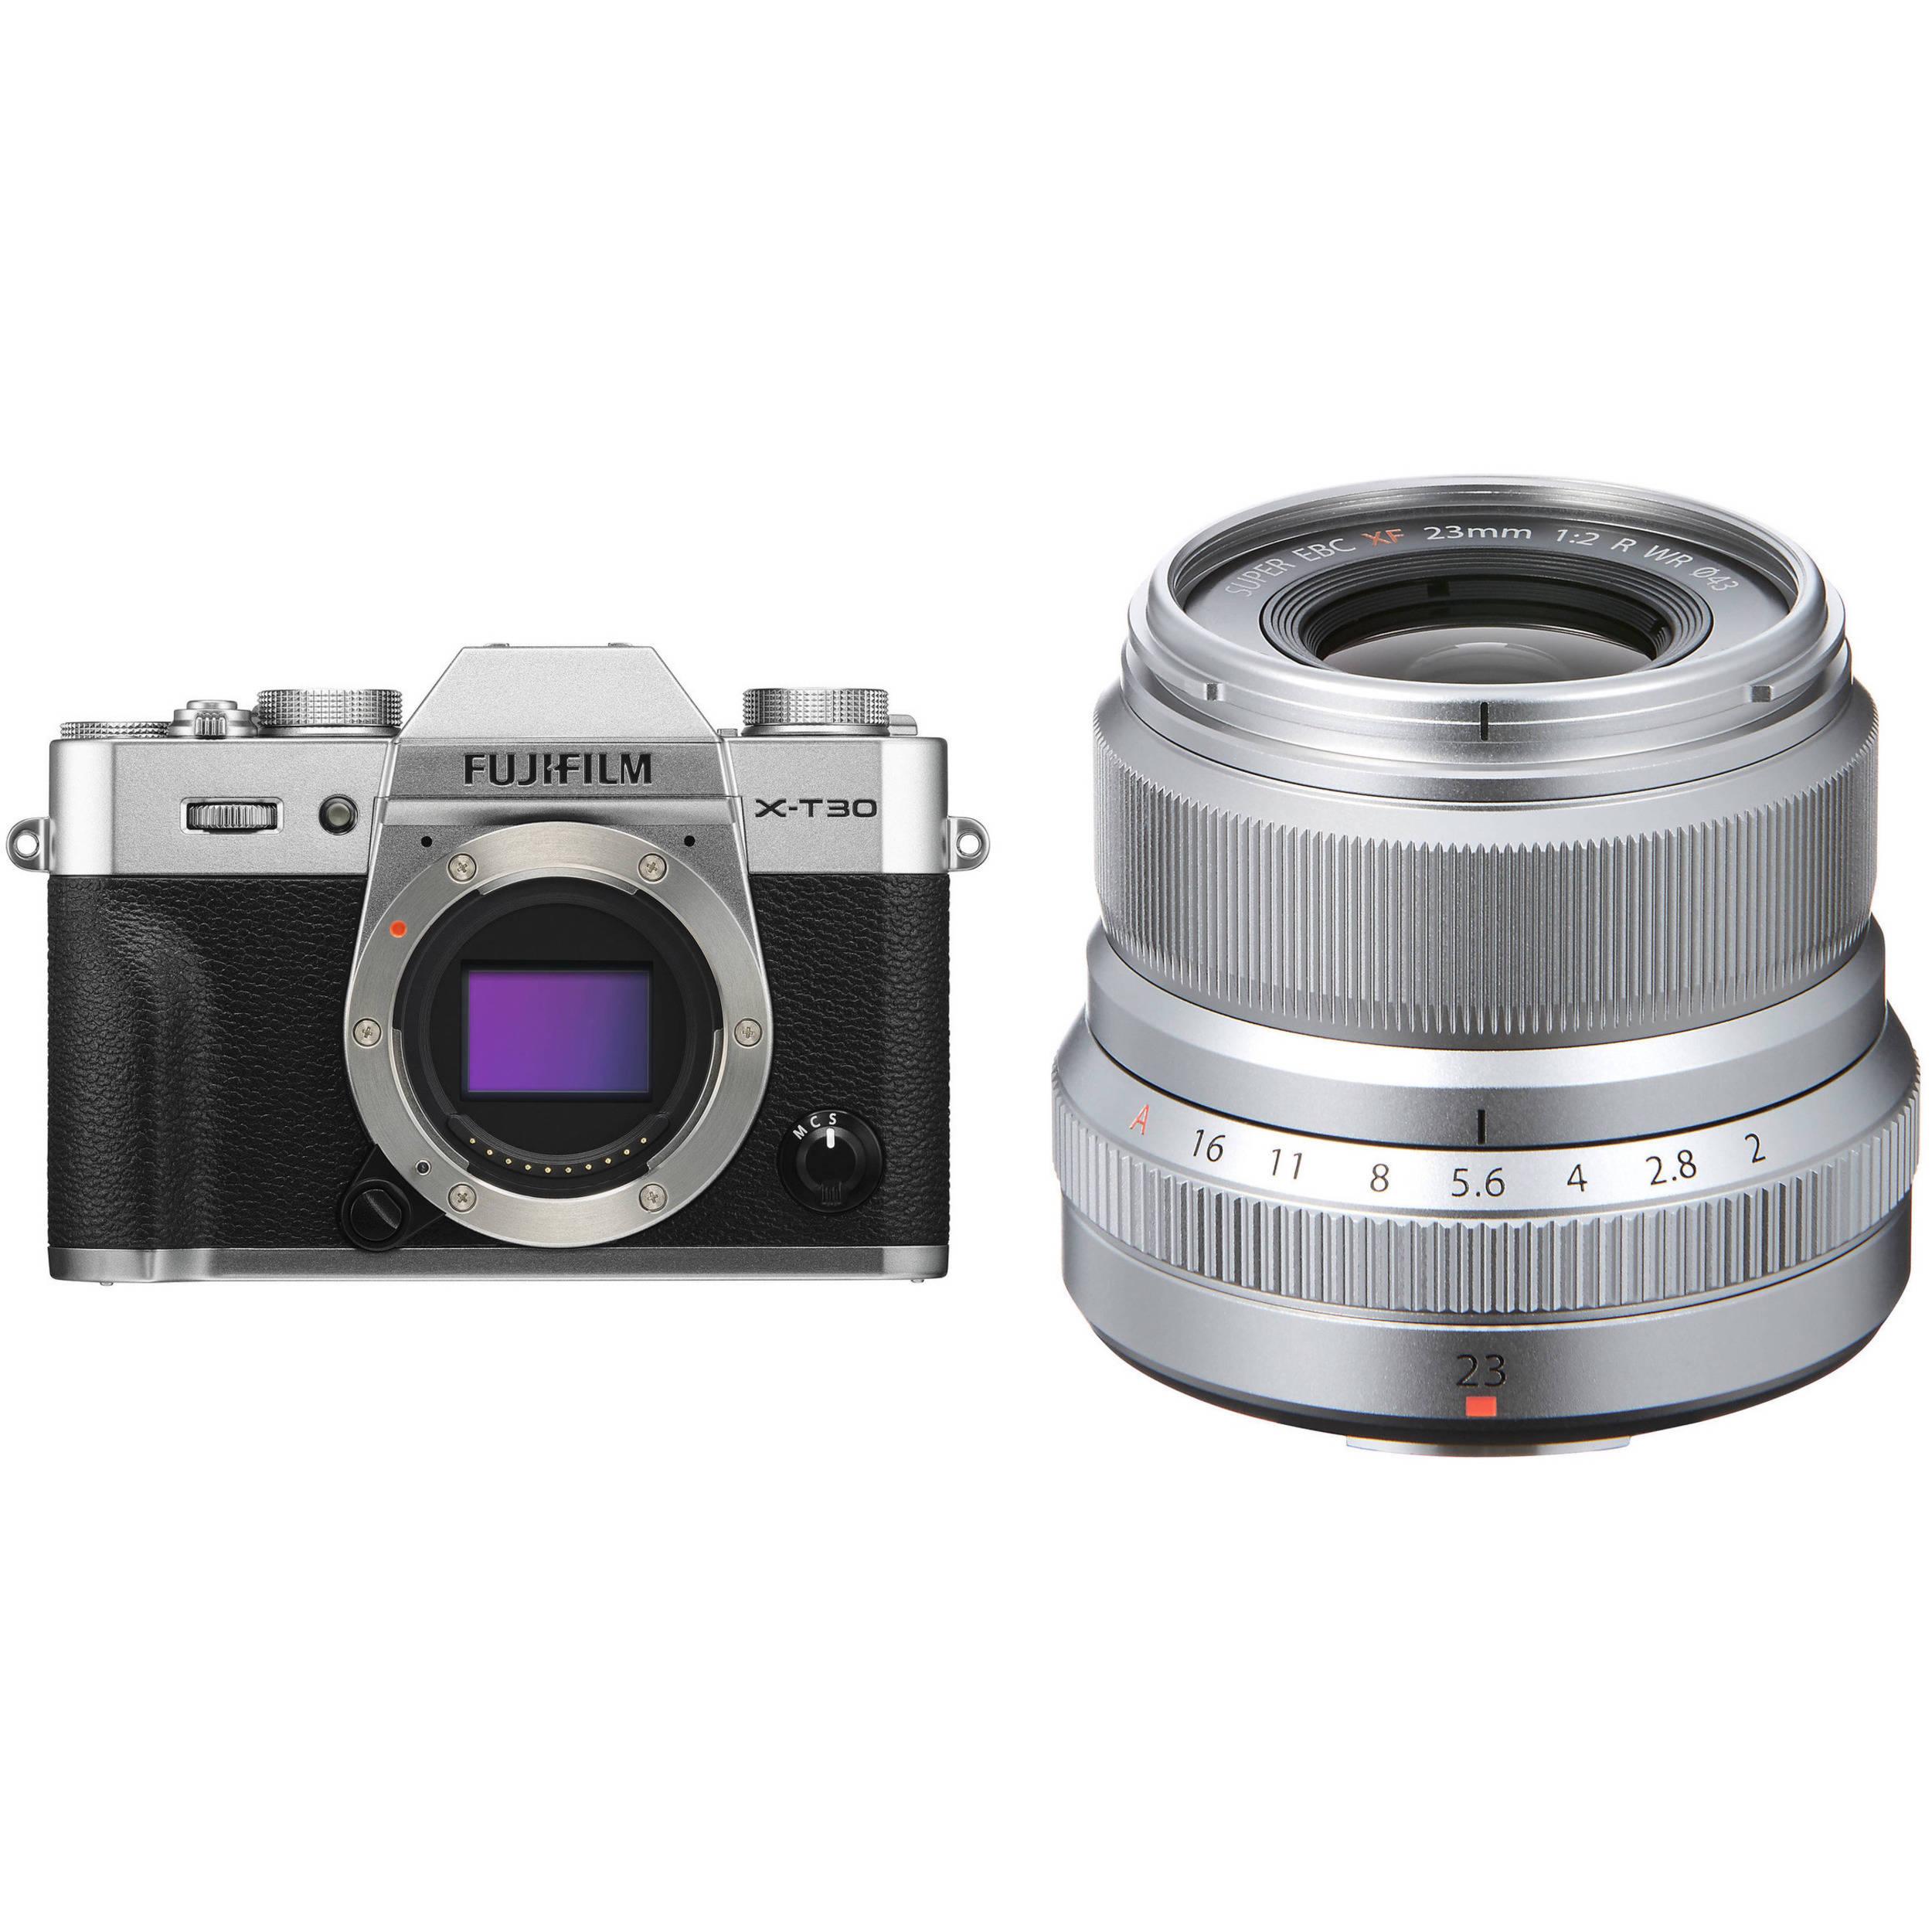 Fuji X Wedding Photography: FUJIFILM X-T30 Mirrorless Digital Camera With 23mm F/2